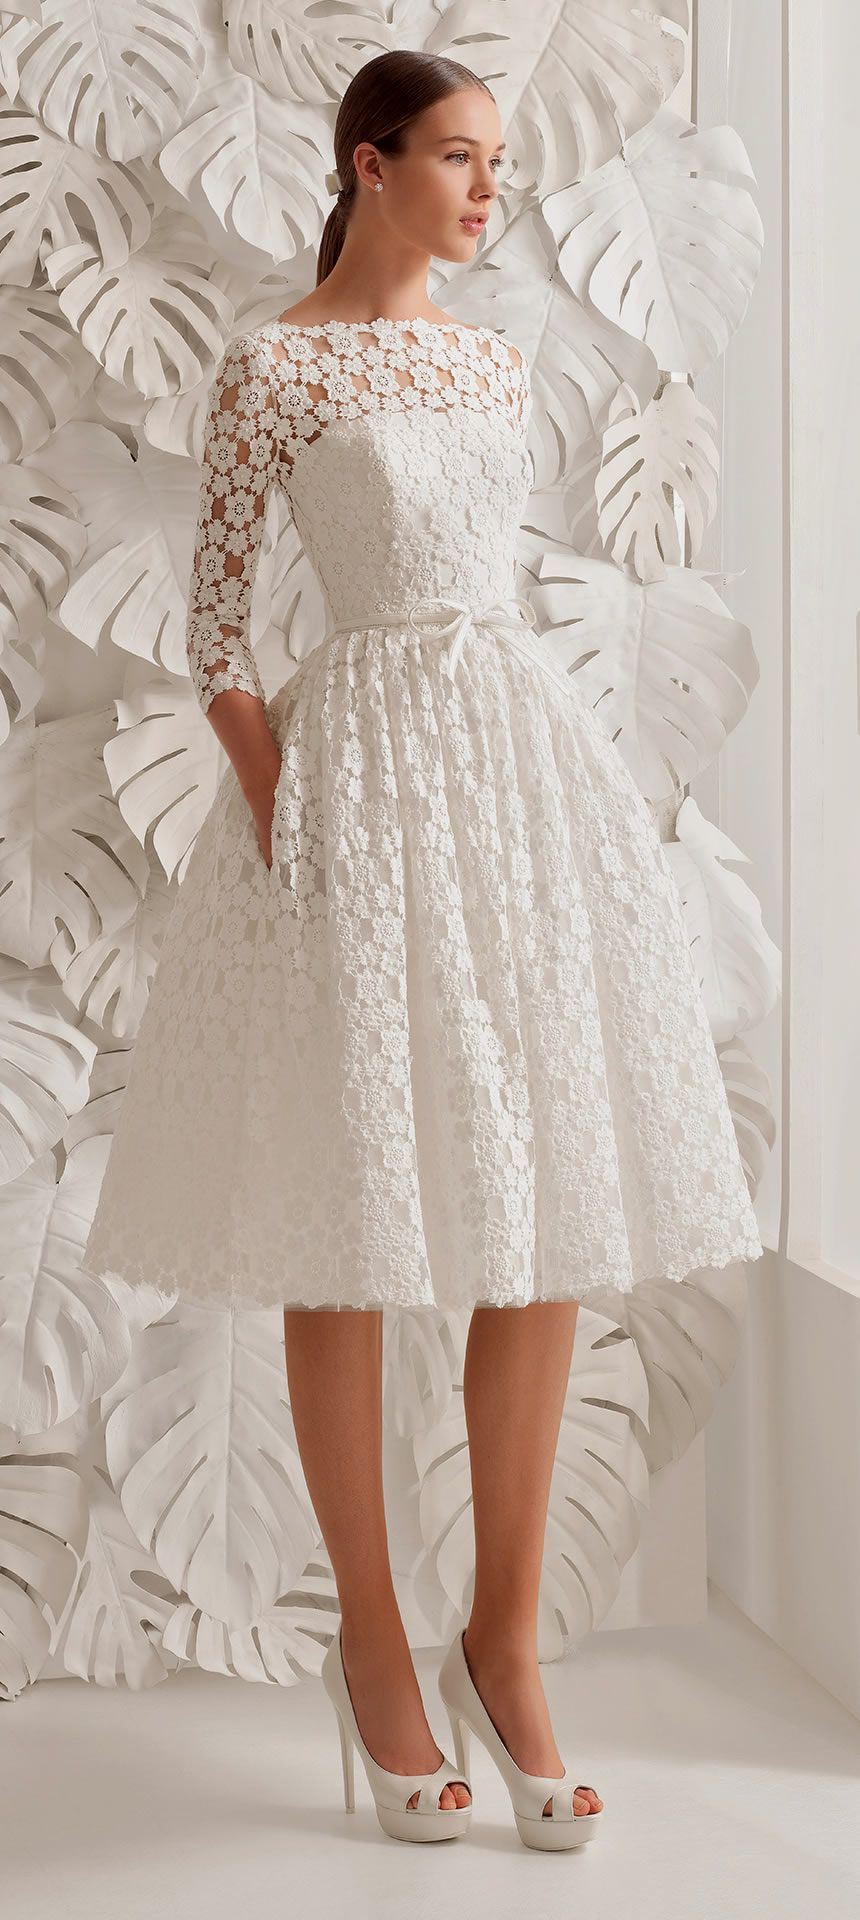 Neri bridal collection rosa clará vestidos pinterest